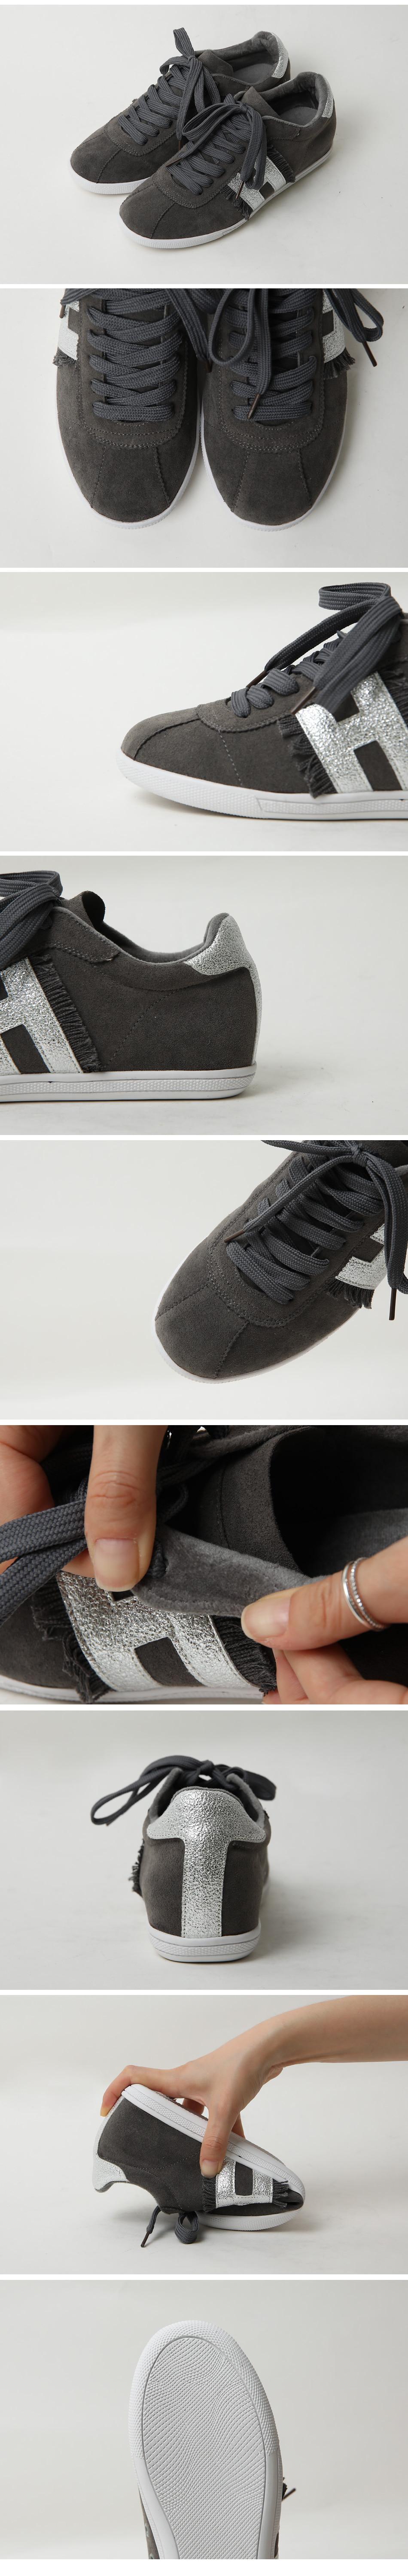 HENIA Height Sneakers 3cm